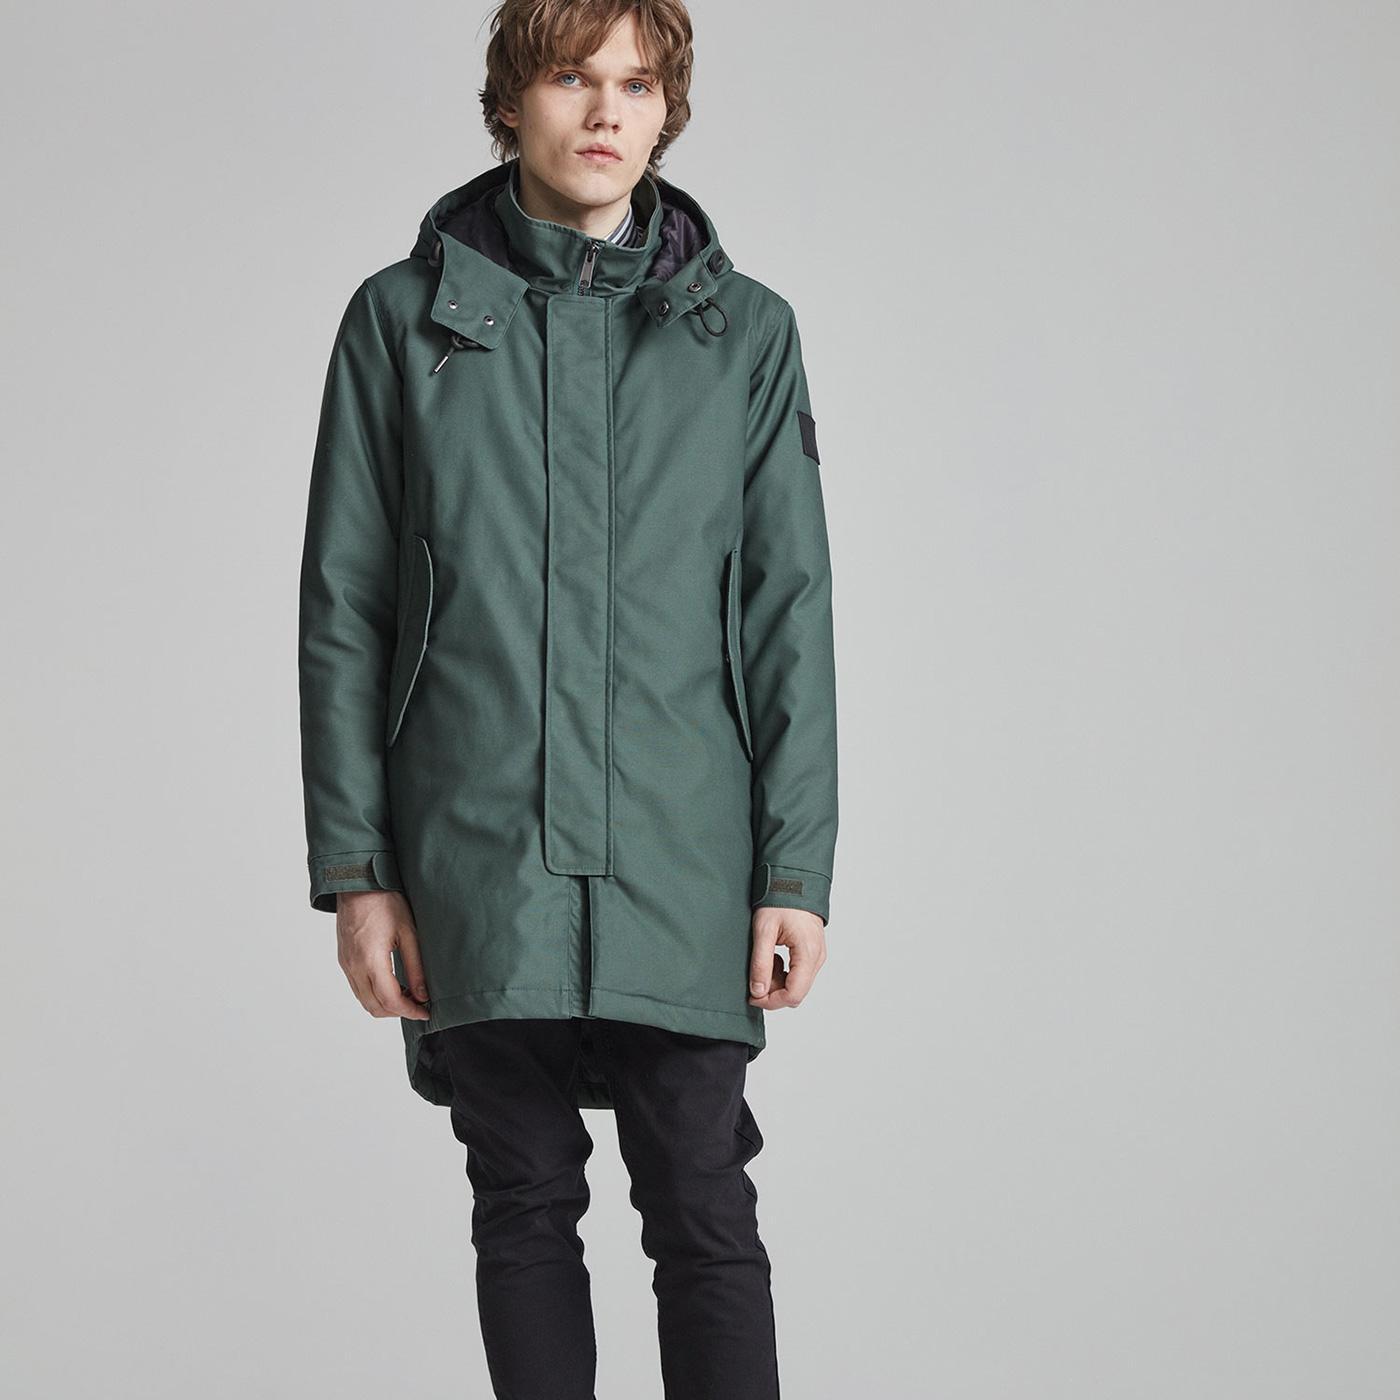 Fishtail Jacket | Makia Clothing